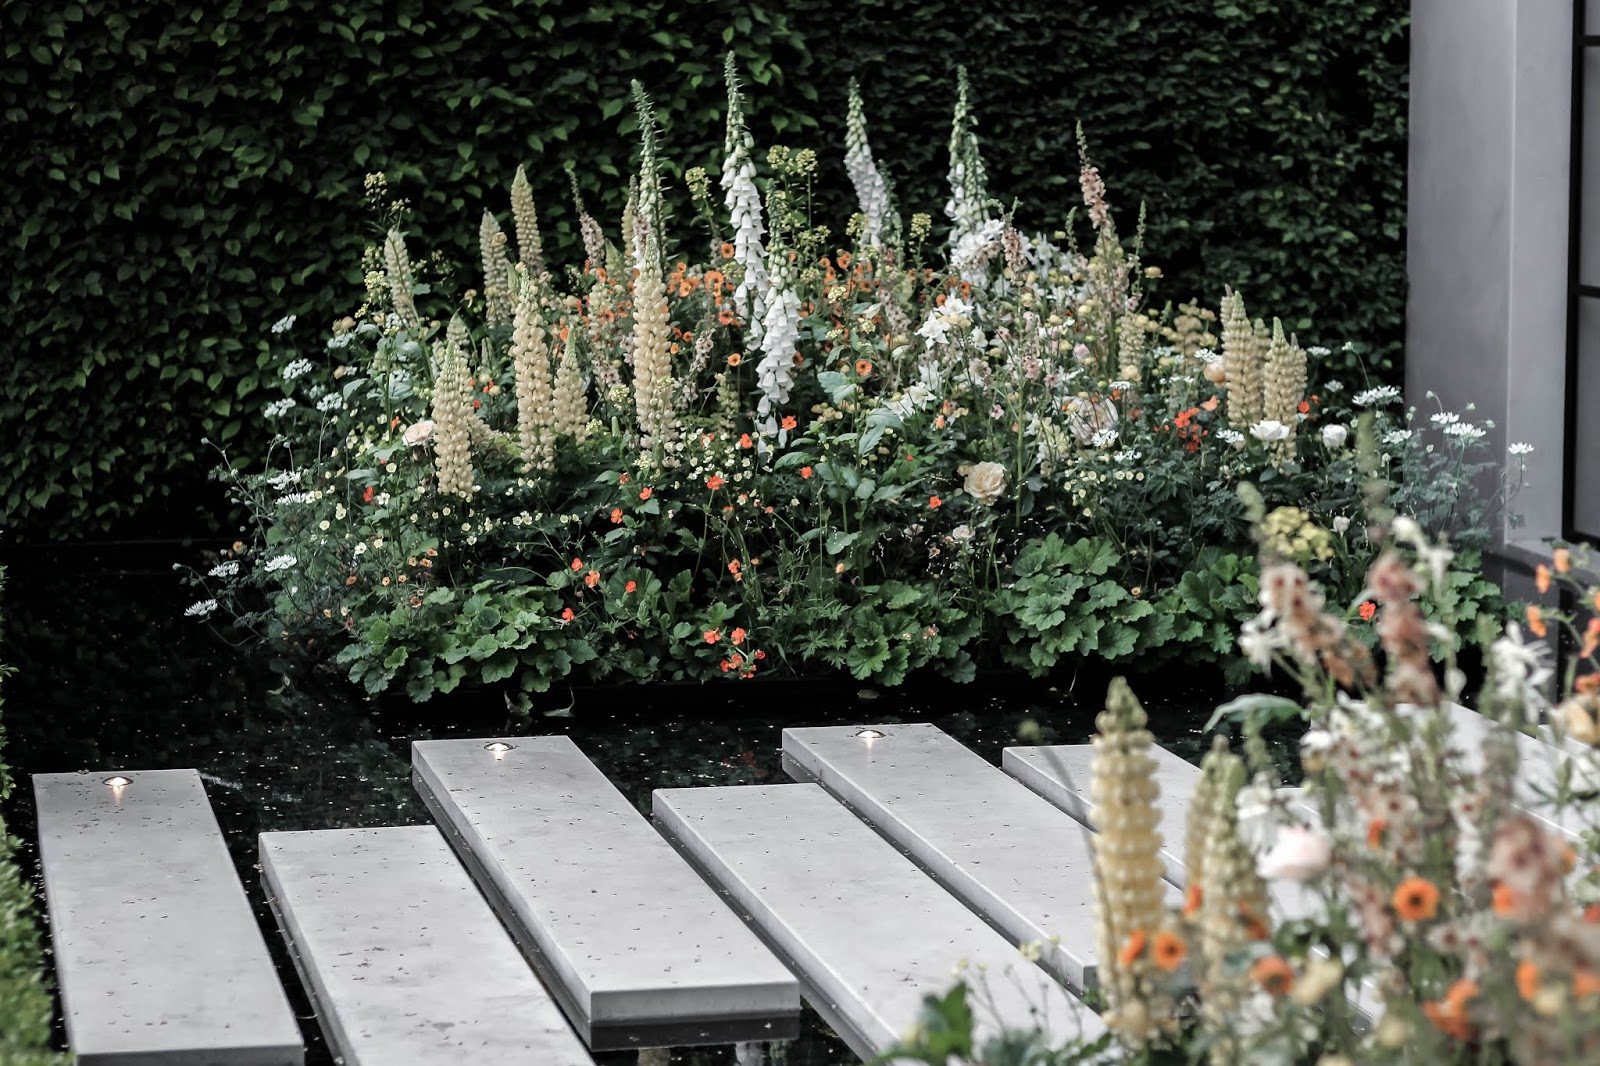 LG Eco-City Garden Exhibit Chelsea Flower Show 2018